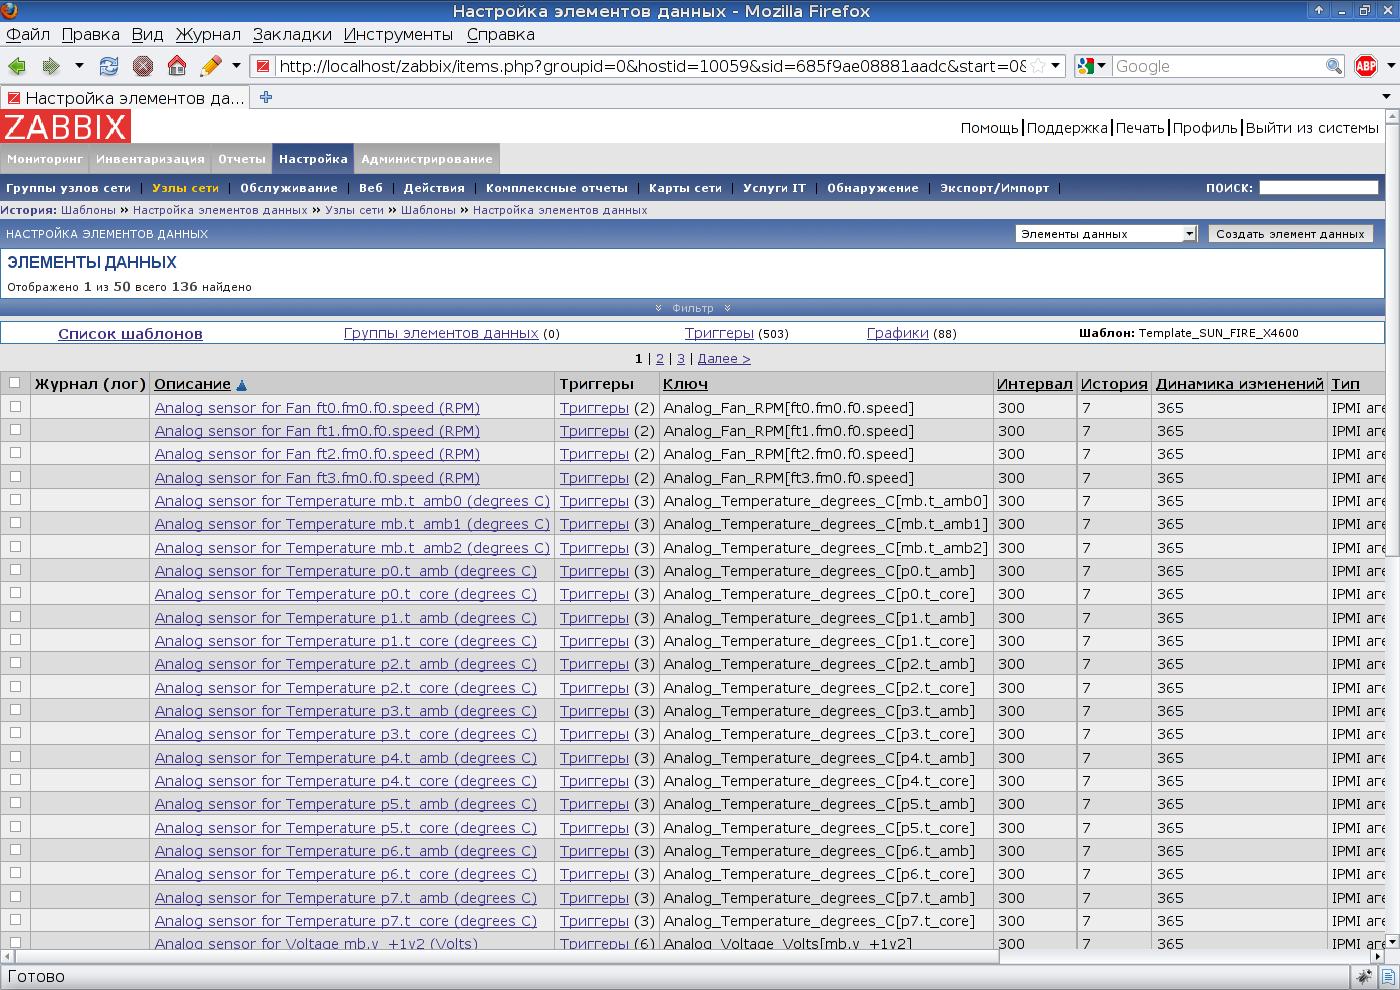 Создание шаблонов для системы мониторинга Zabbix - Блог - Tune IT